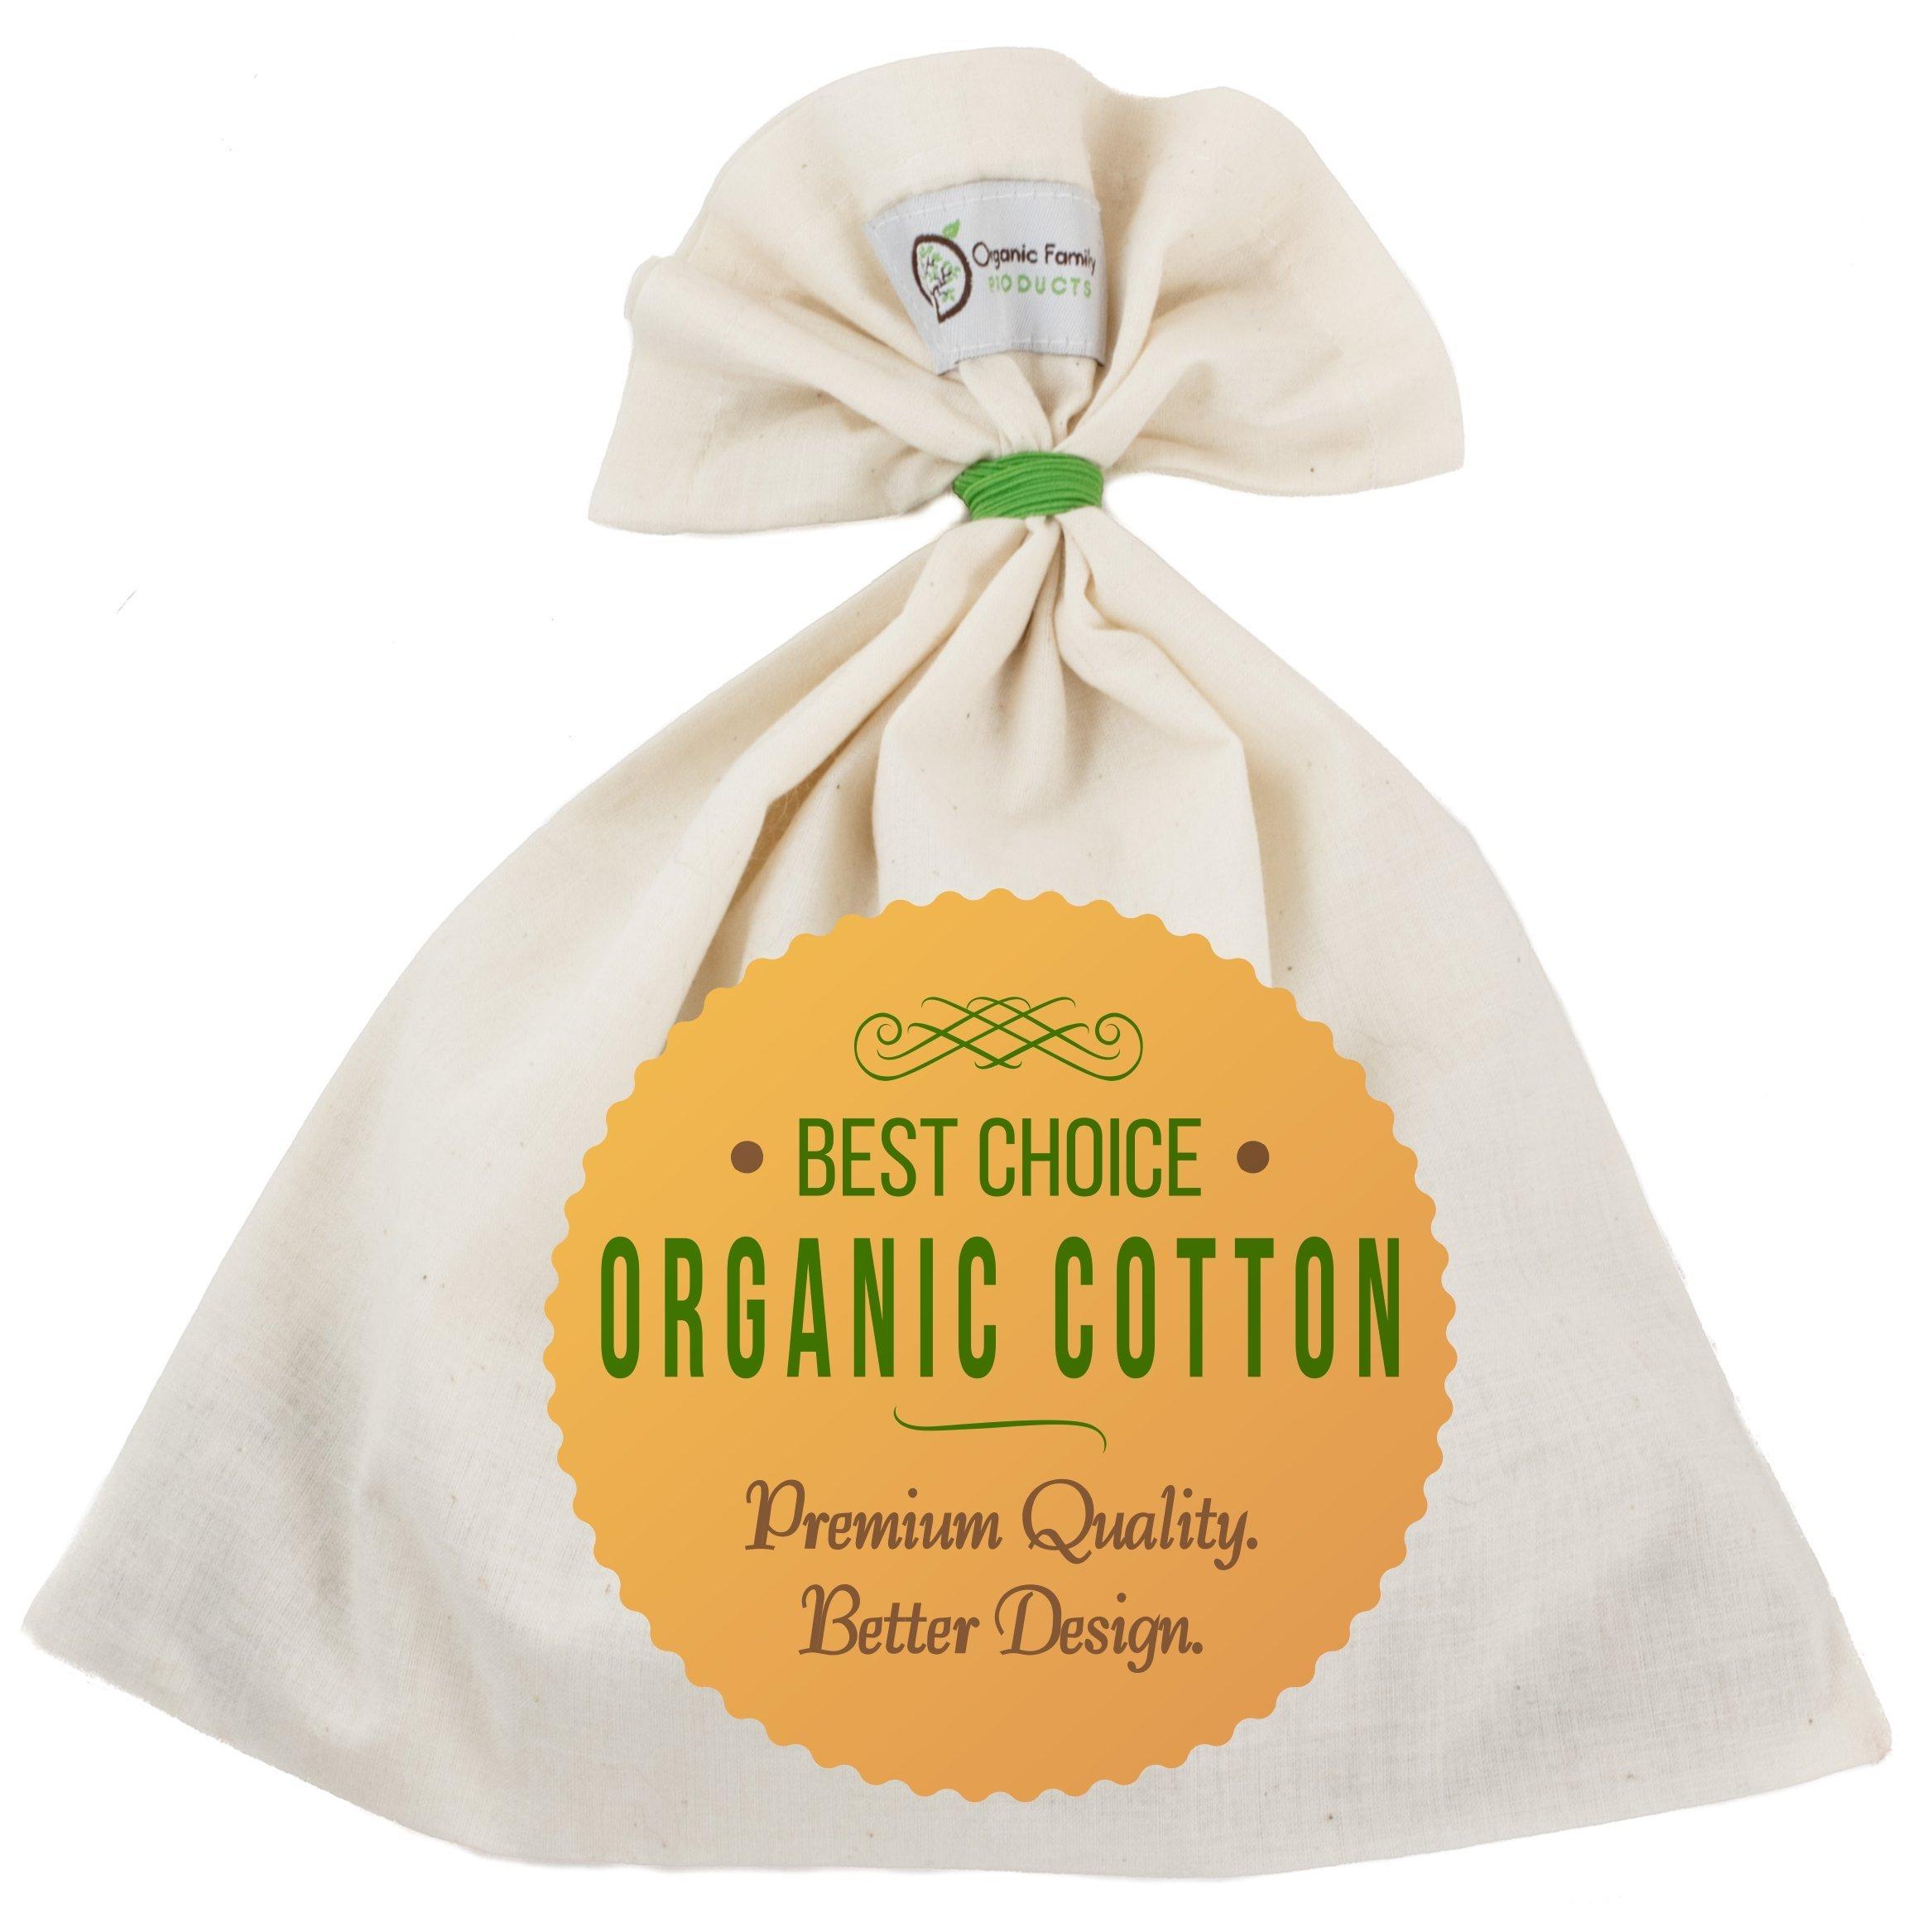 Organic Cotton Nut Milk Bag - Super Smooth Almond Milk Maker - No Seam Bottom, Drawstring Free - Professional Reusable Food Strainer for Yogurt, Cheese, Juice, Tea, Coffee - Natural & Eco-Friendly